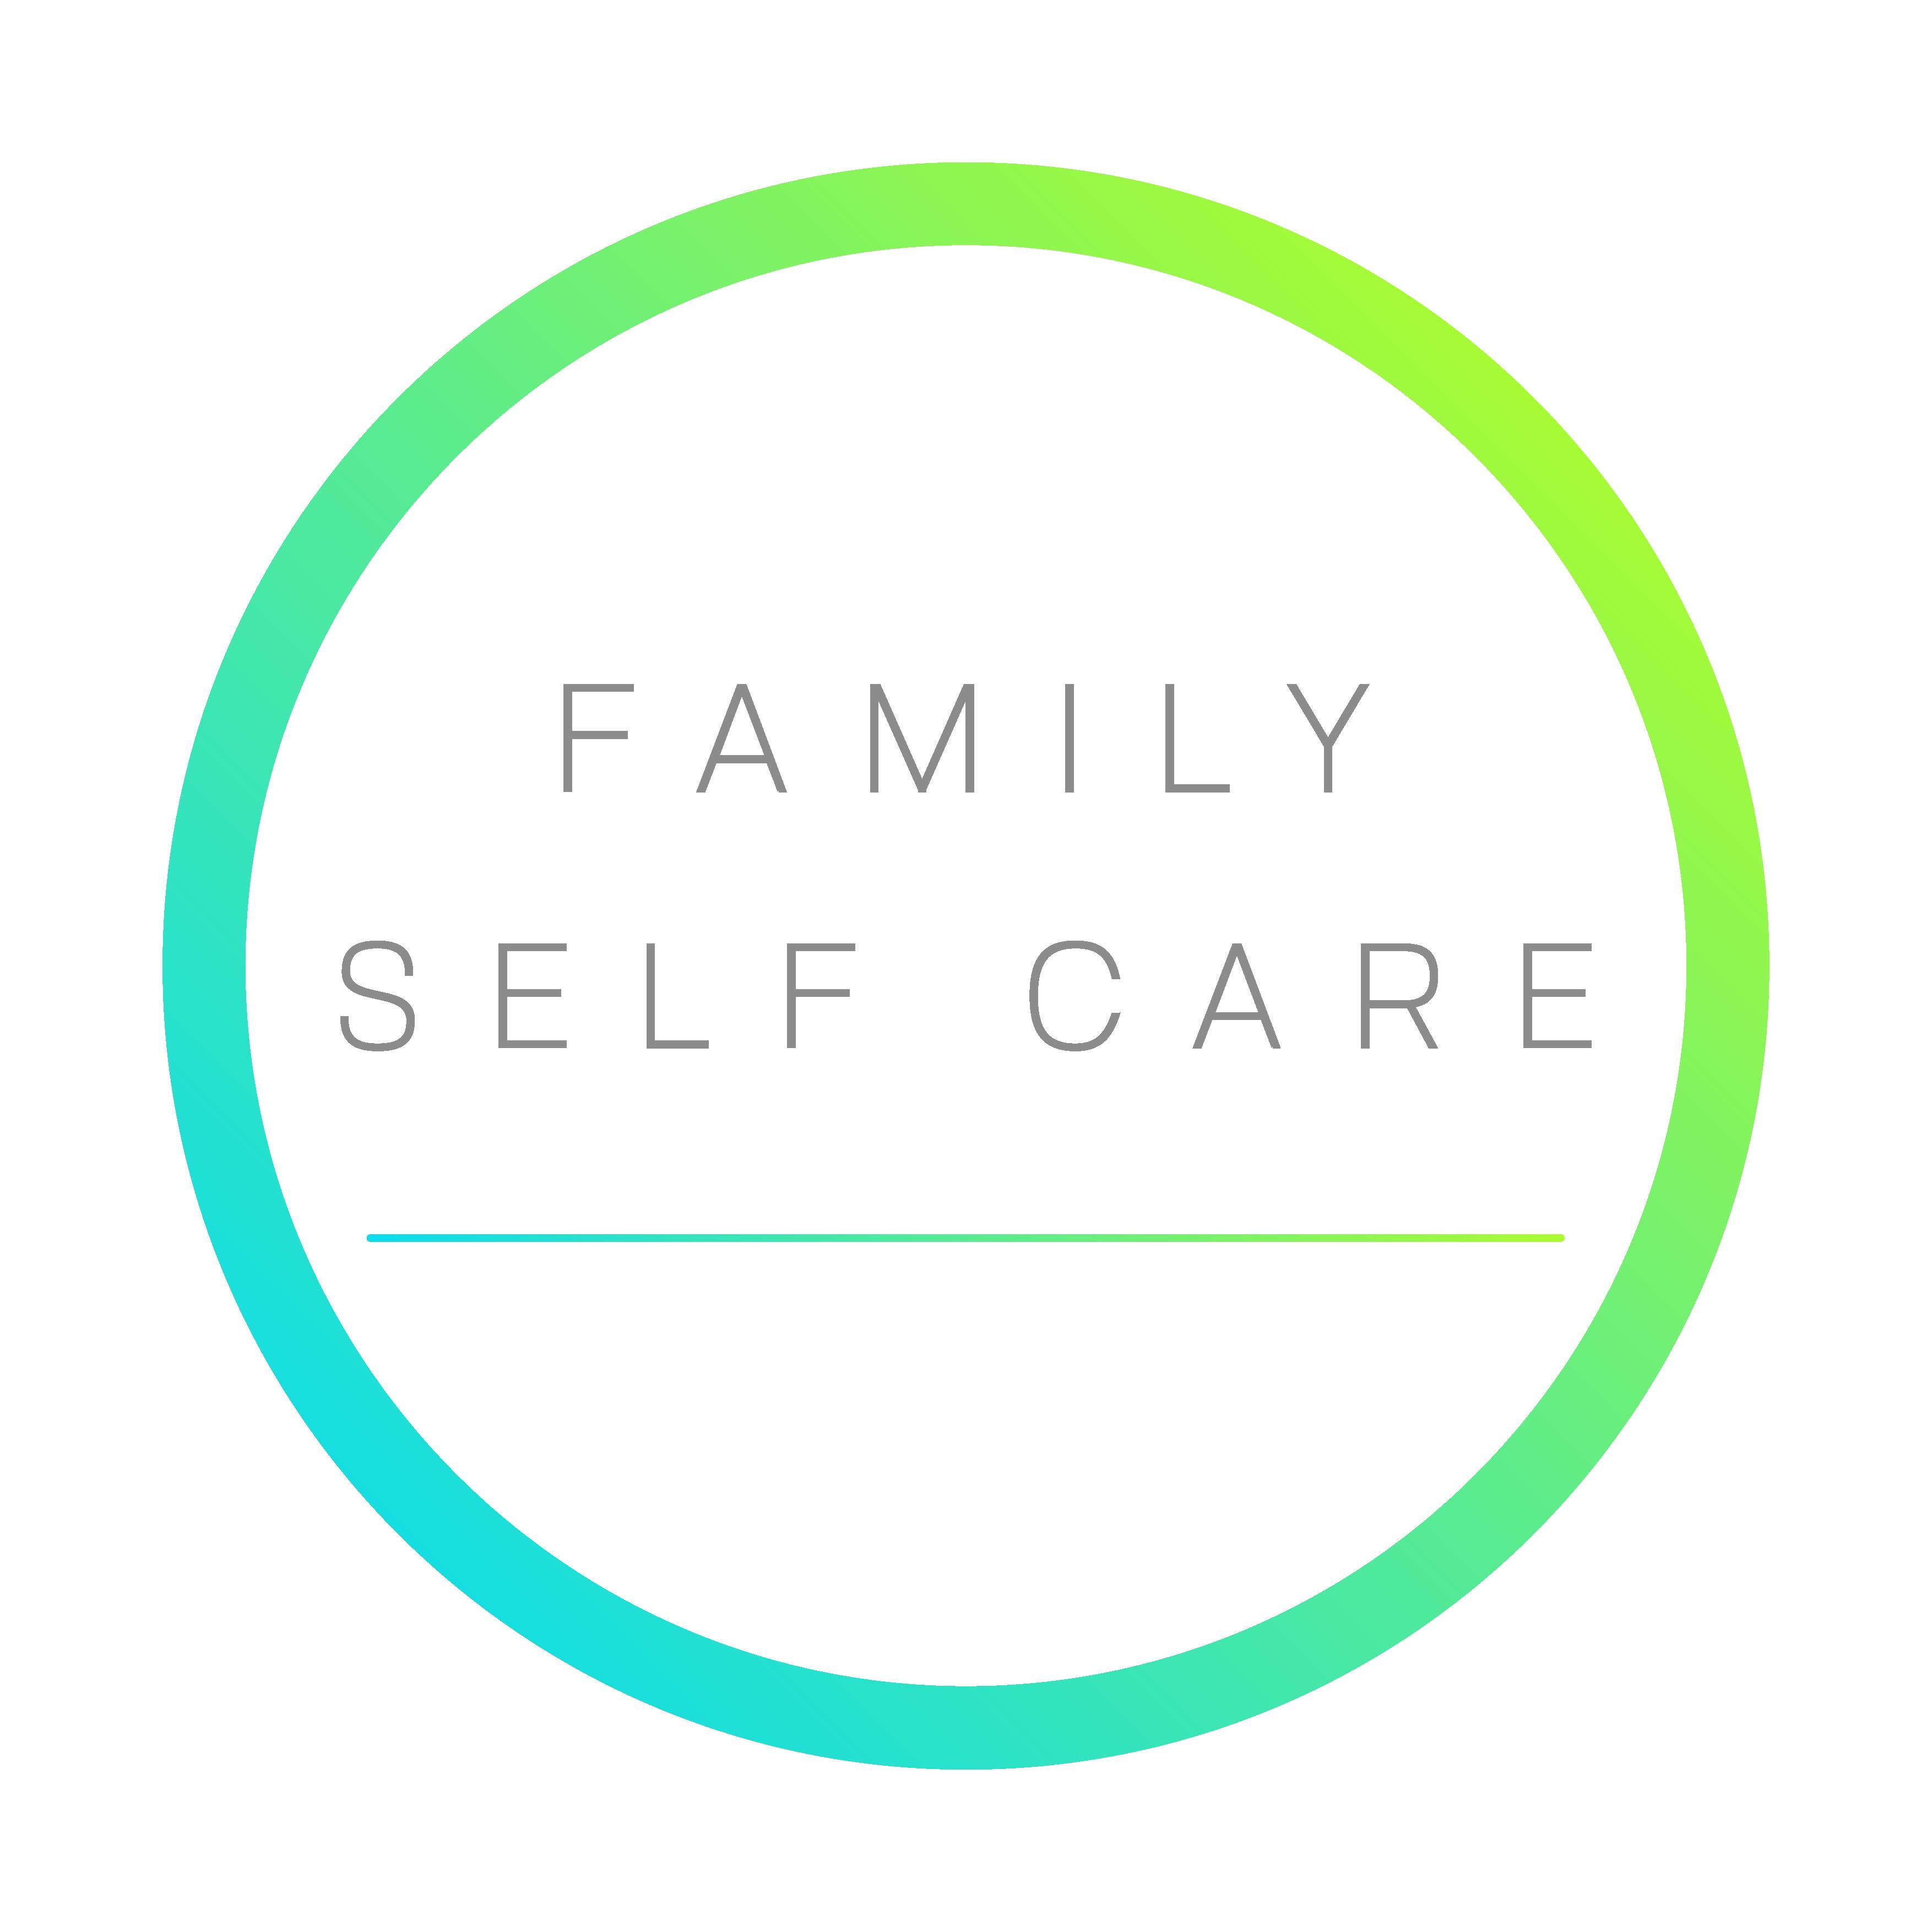 Family Self Care